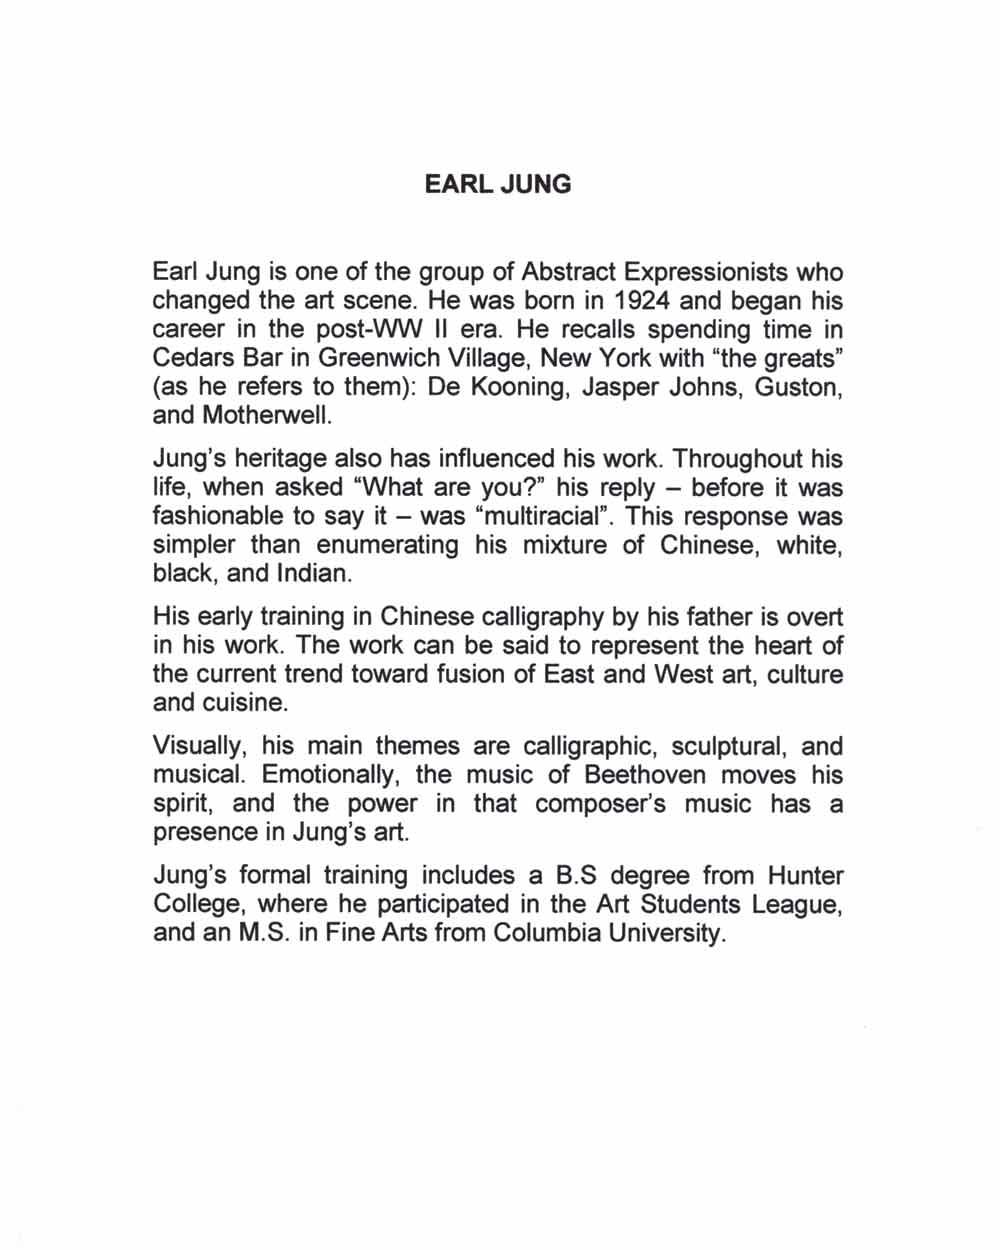 Earl Jung's Biography